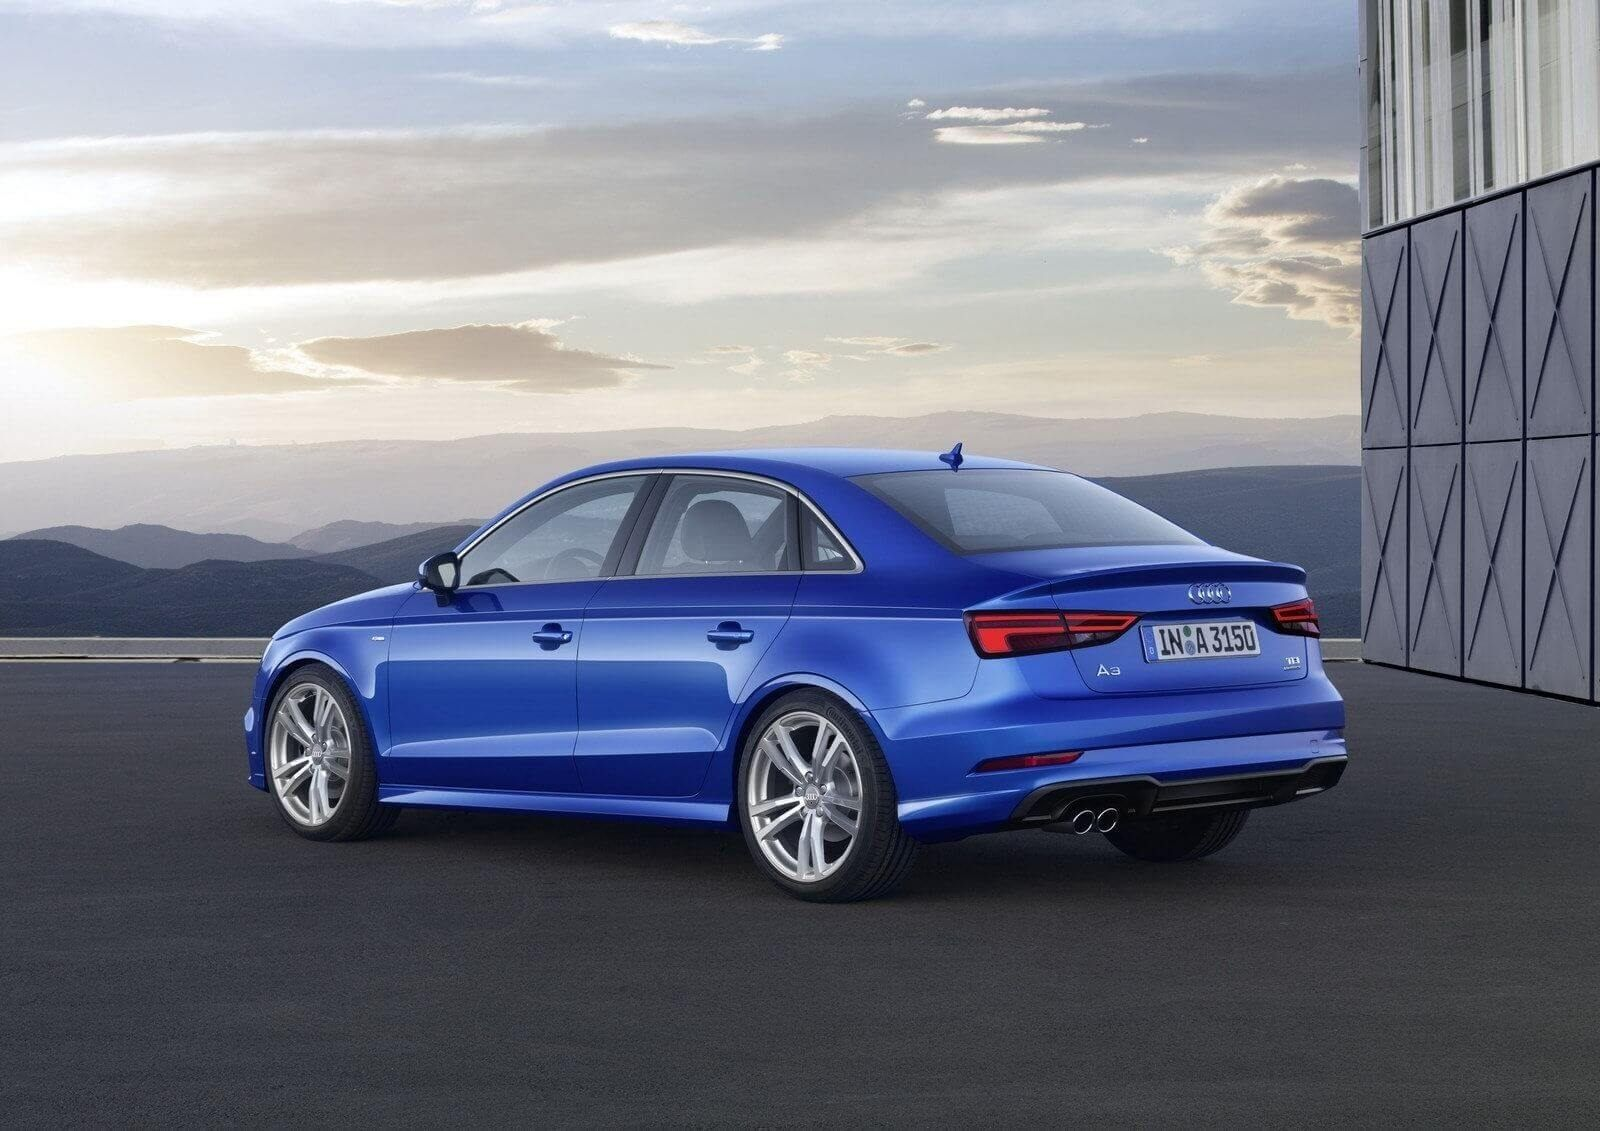 Audi: The New 2019-2020 Audi S3 Wallpaper Hd - 2019-2020 ...